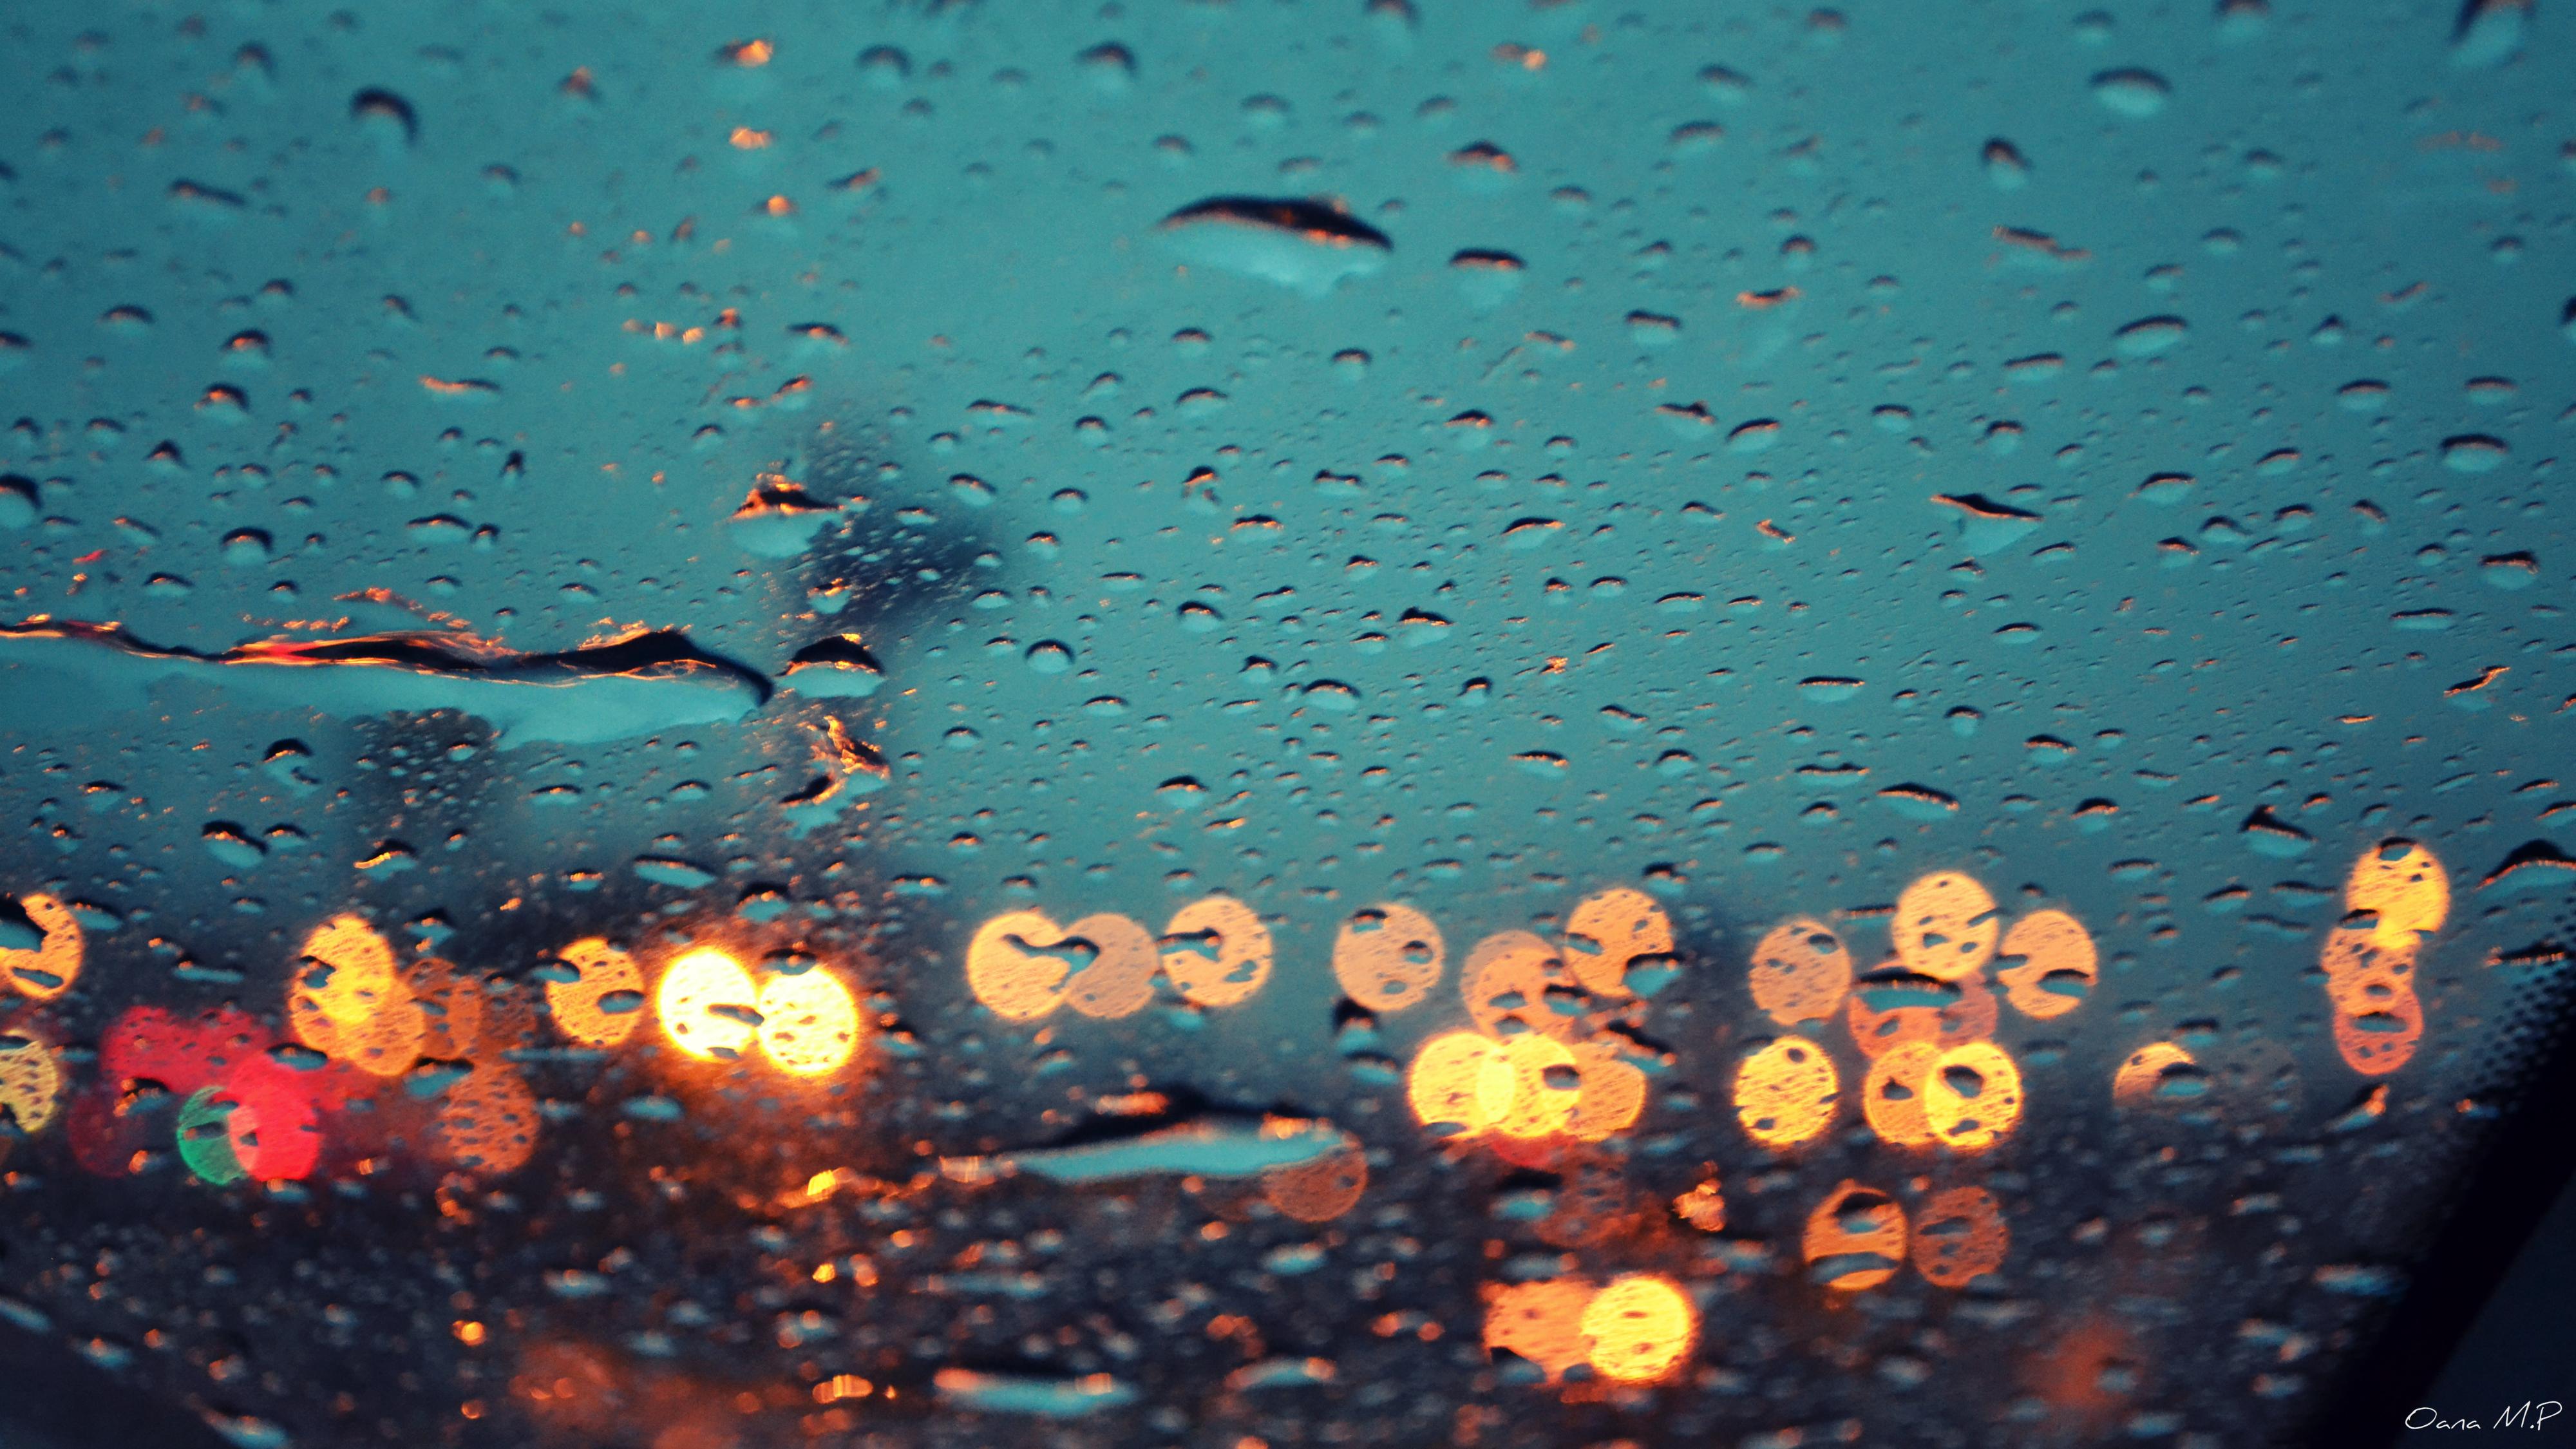 Ночь дождь луна картинки днях